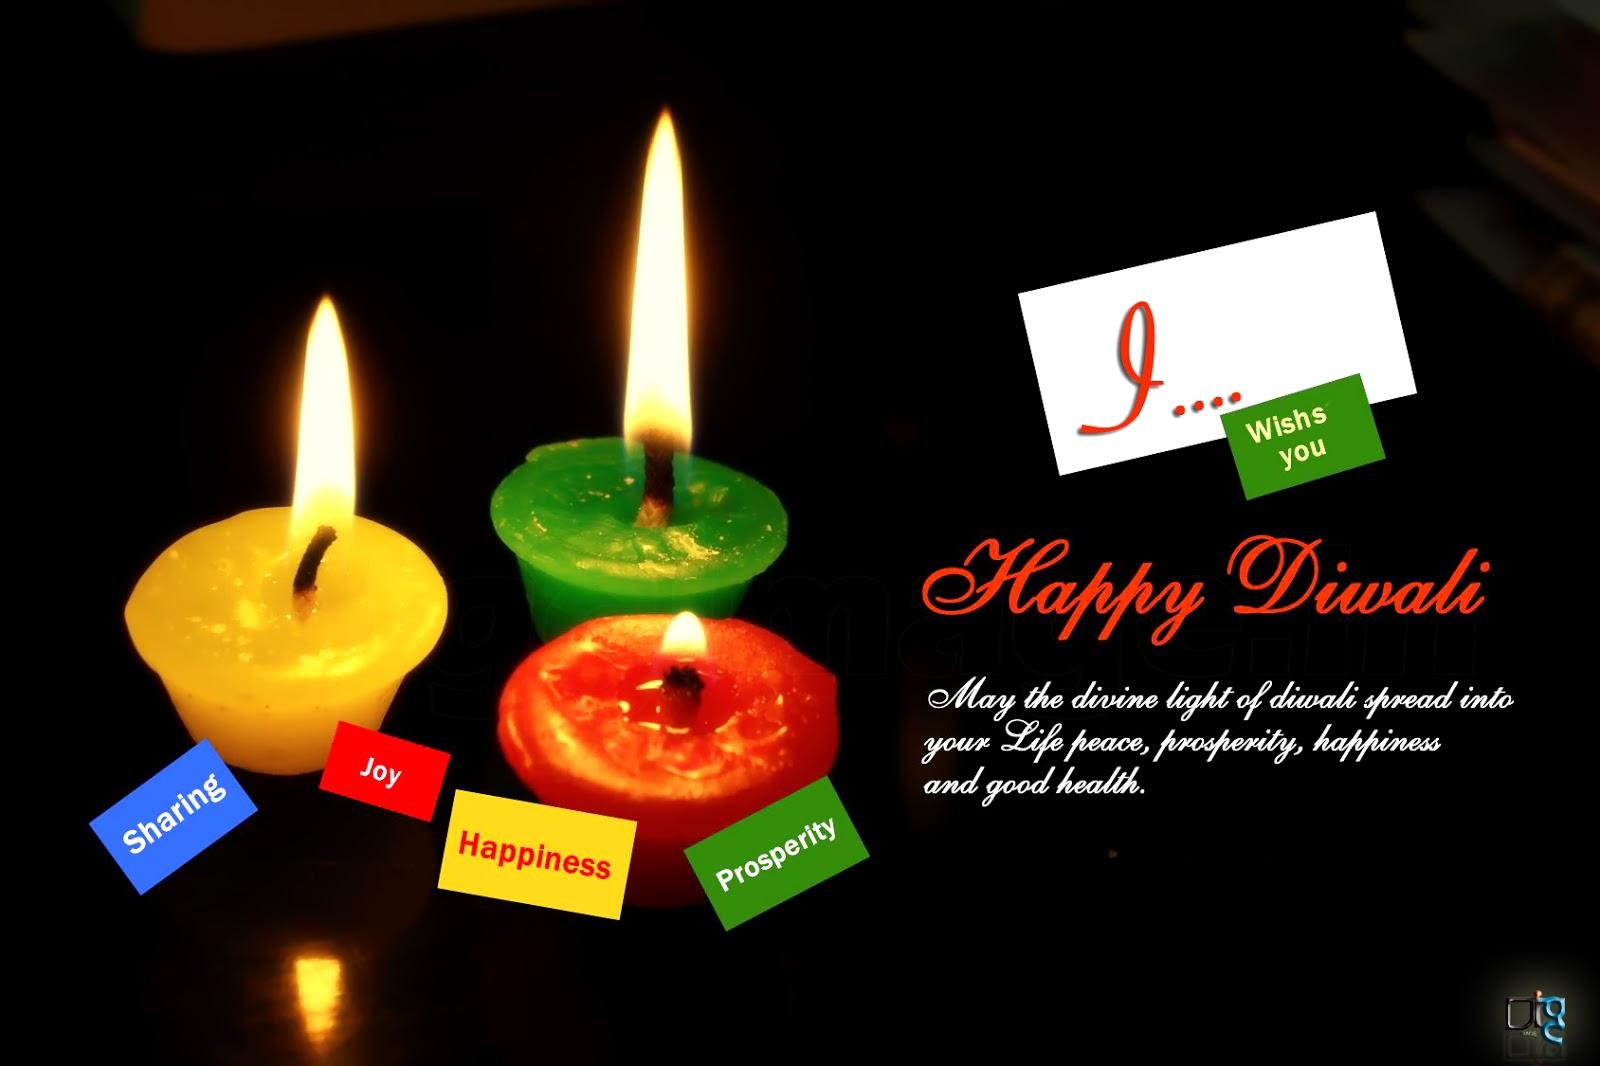 Diwali Greetings Diwali Wishes Wish You Happy Dipawali Google